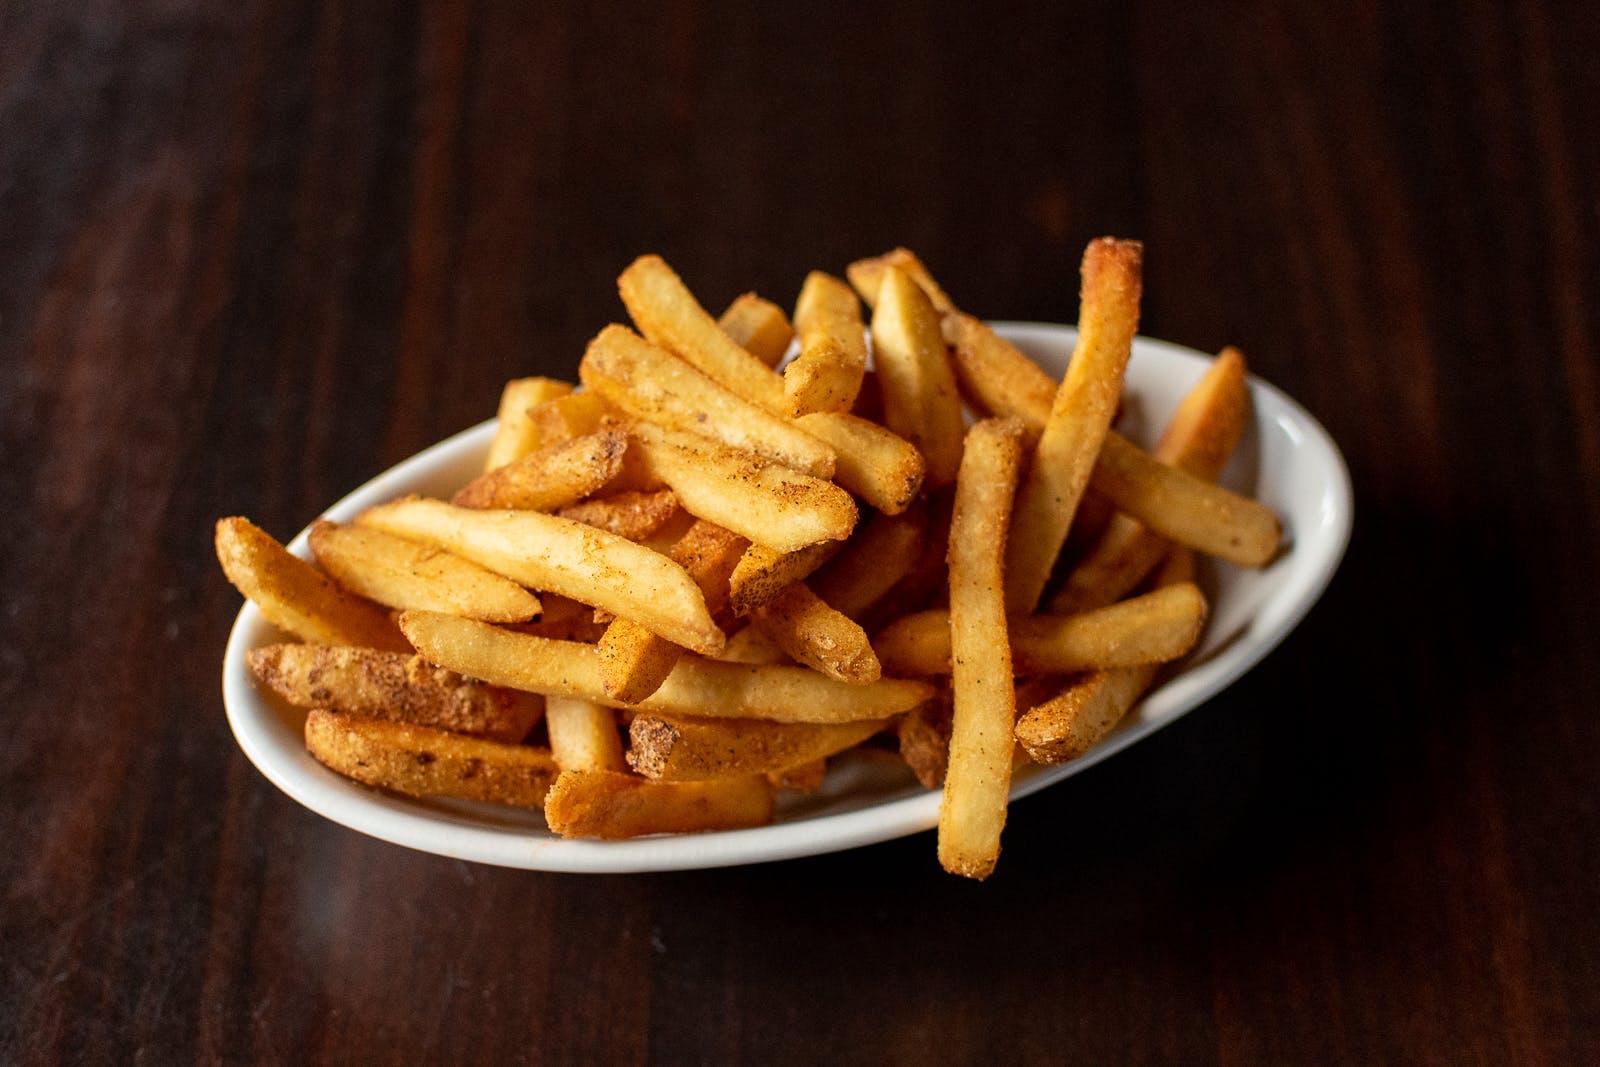 Fries from Midcoast Wings - University Ave in Cedar Falls, IA